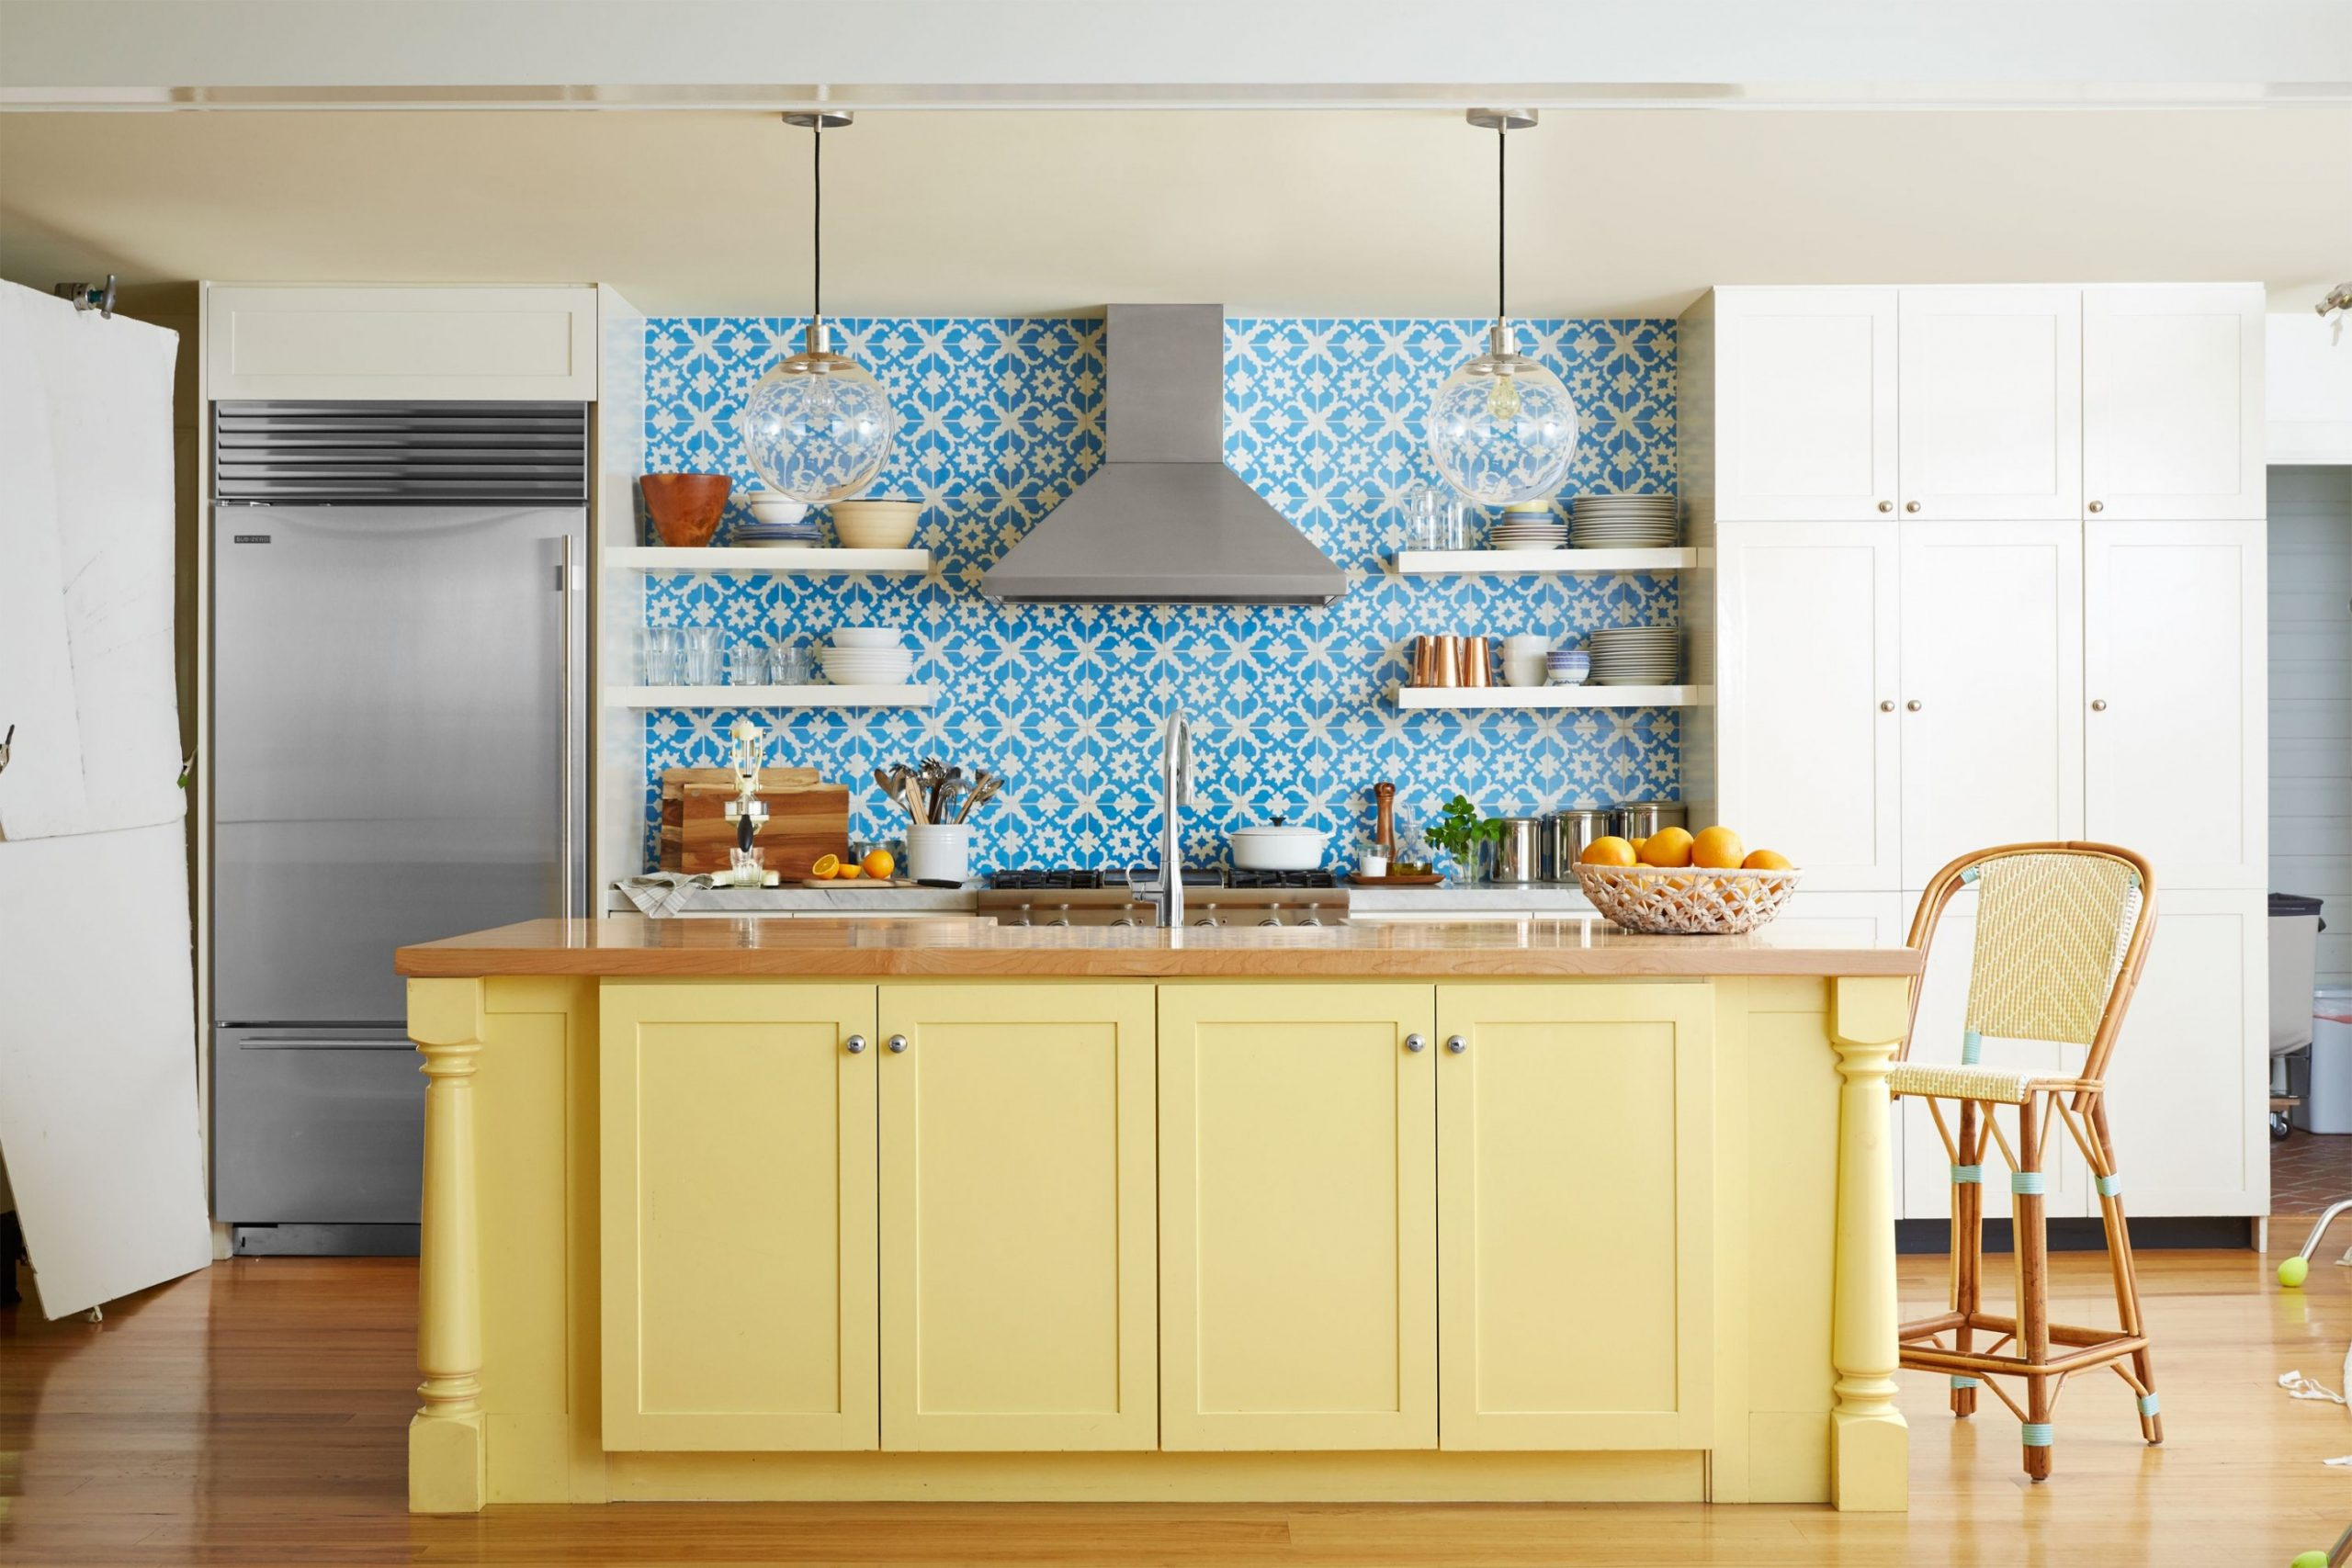 11 Kitchen Color Ideas - Best Kitchen Paint Color Schemes - Yellow Kitchen With Blue Cabinets